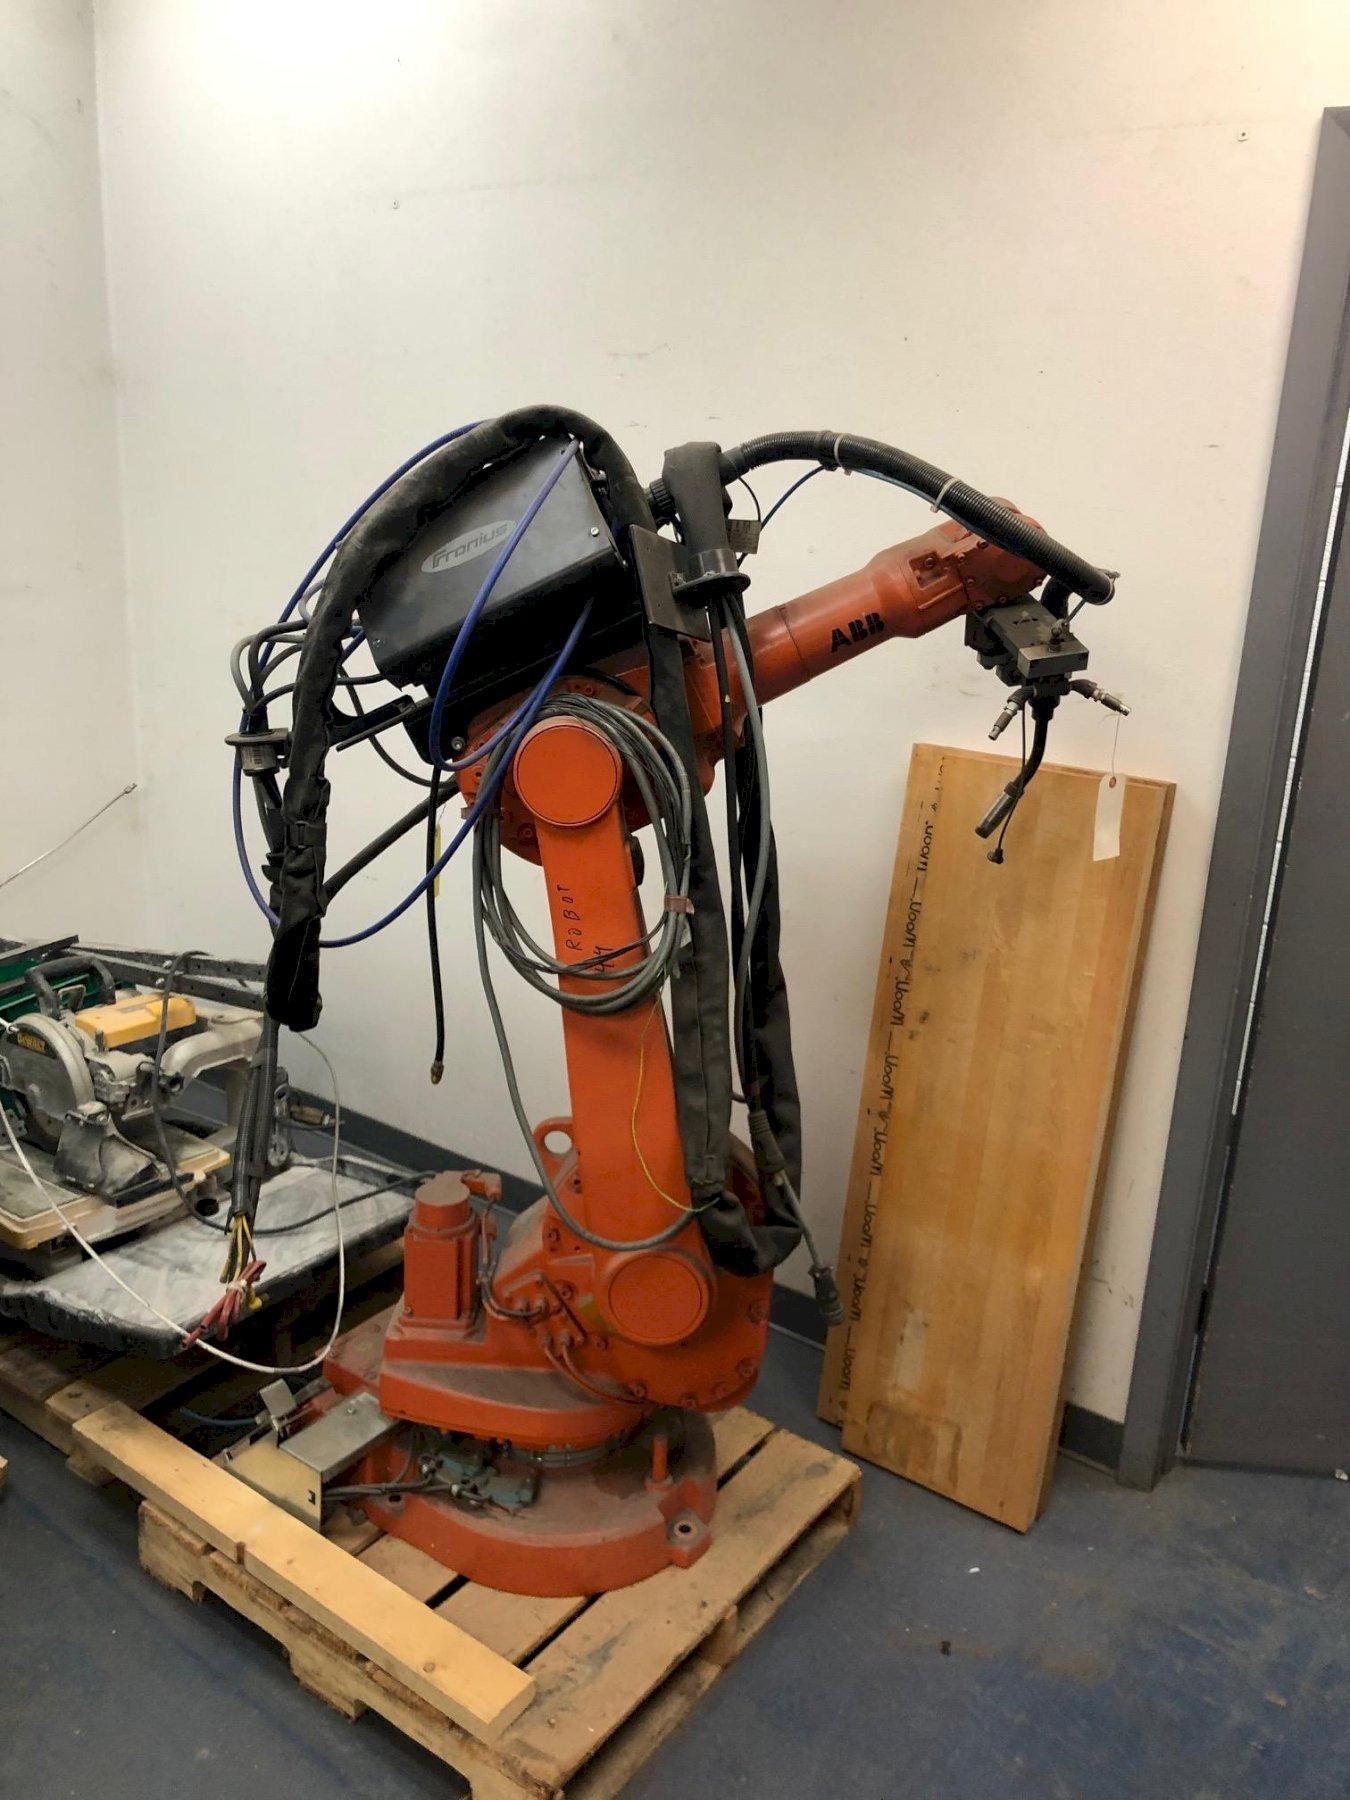 ABB Robot Model# IRB 1600 M2004